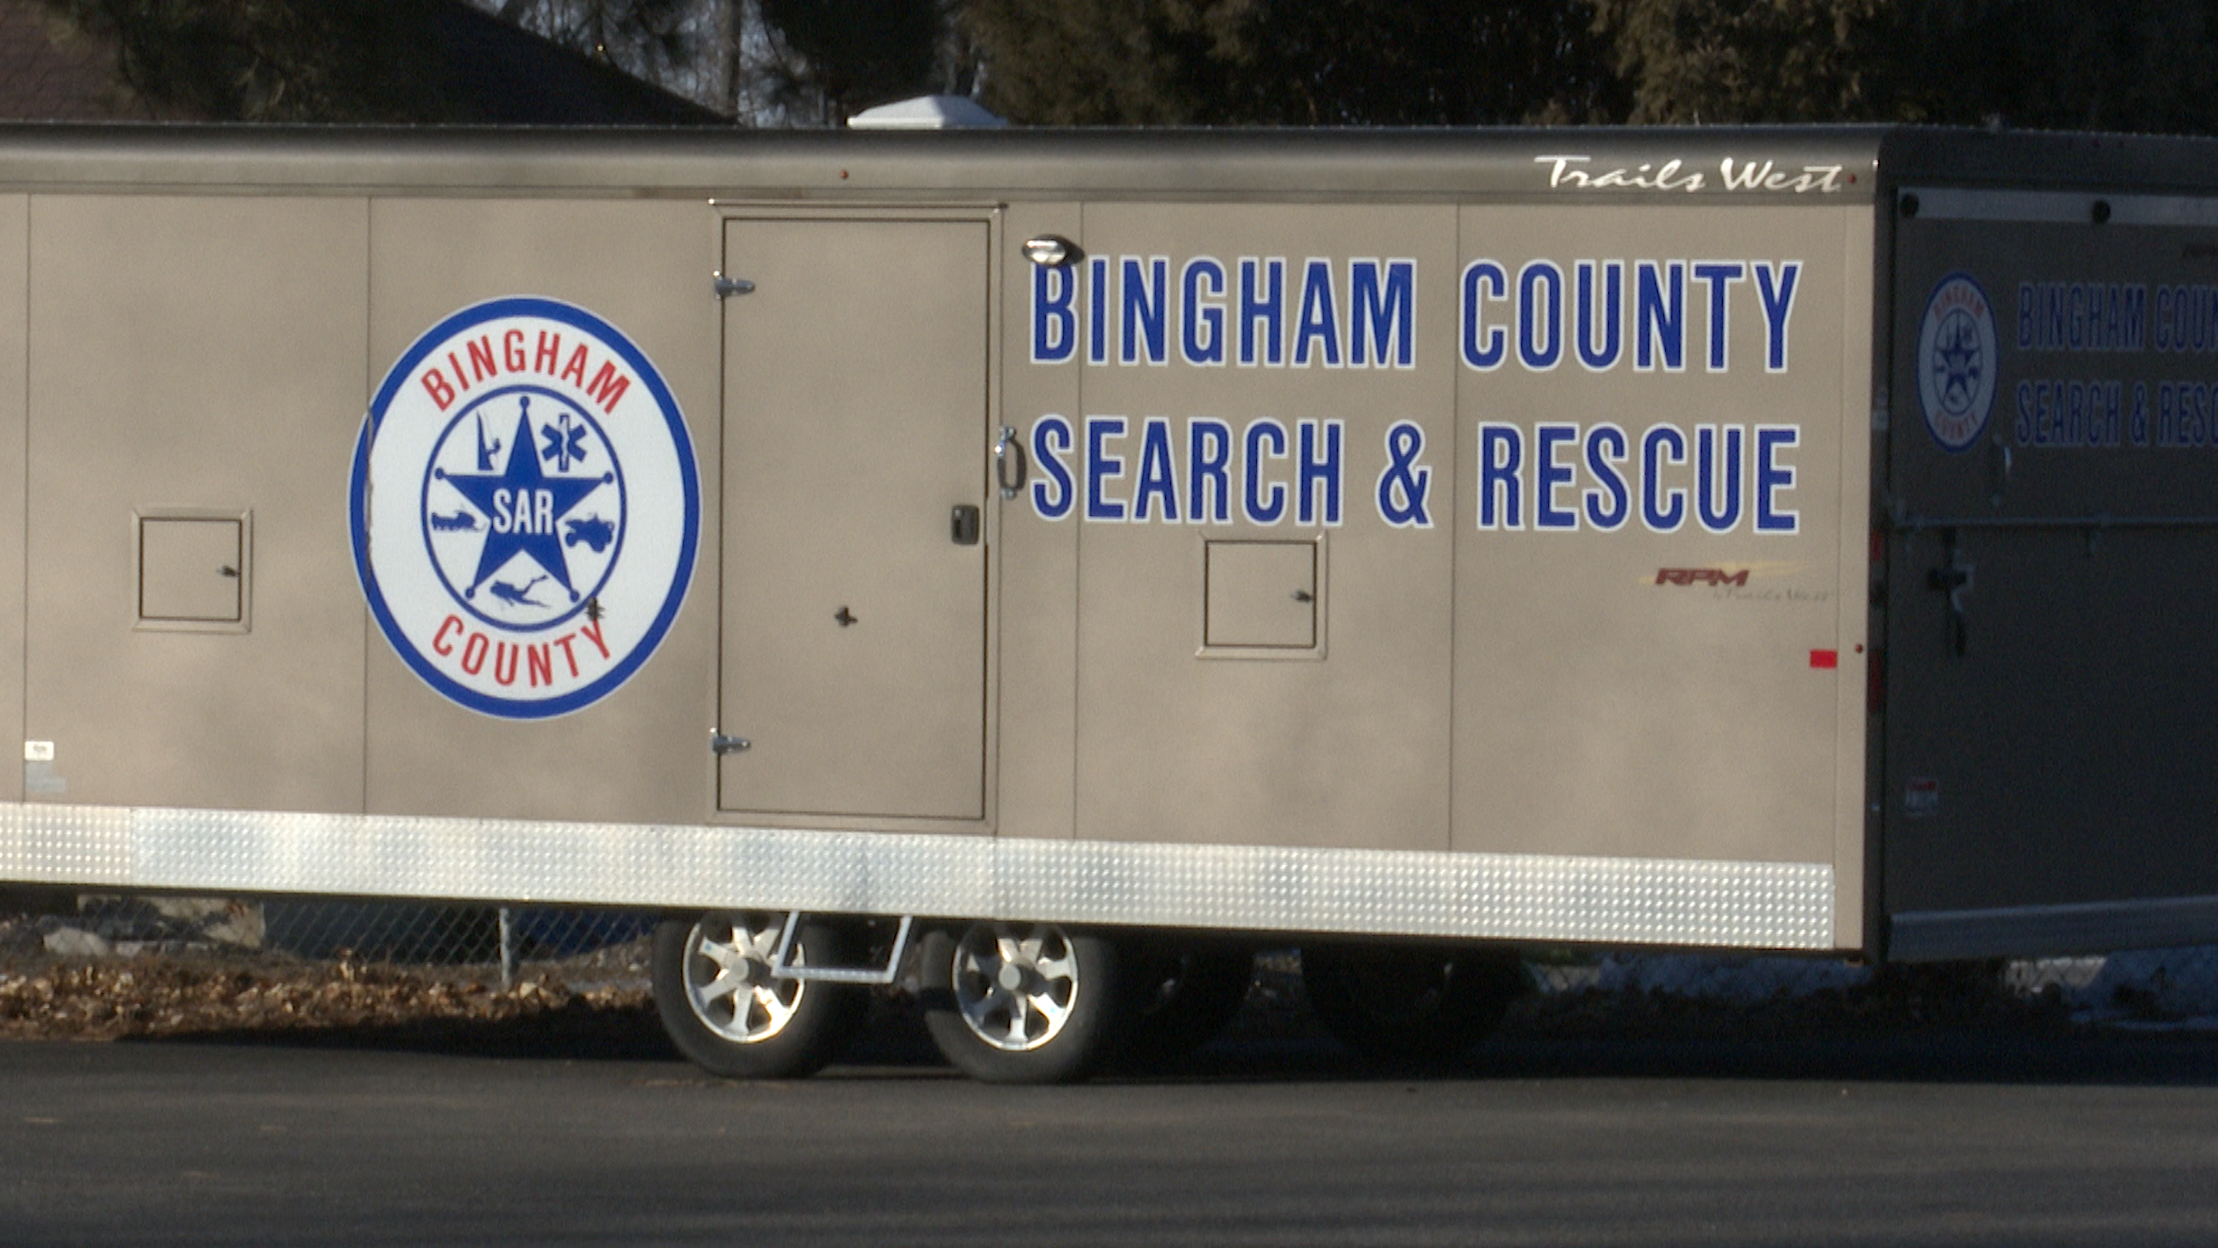 Bingham County SAR